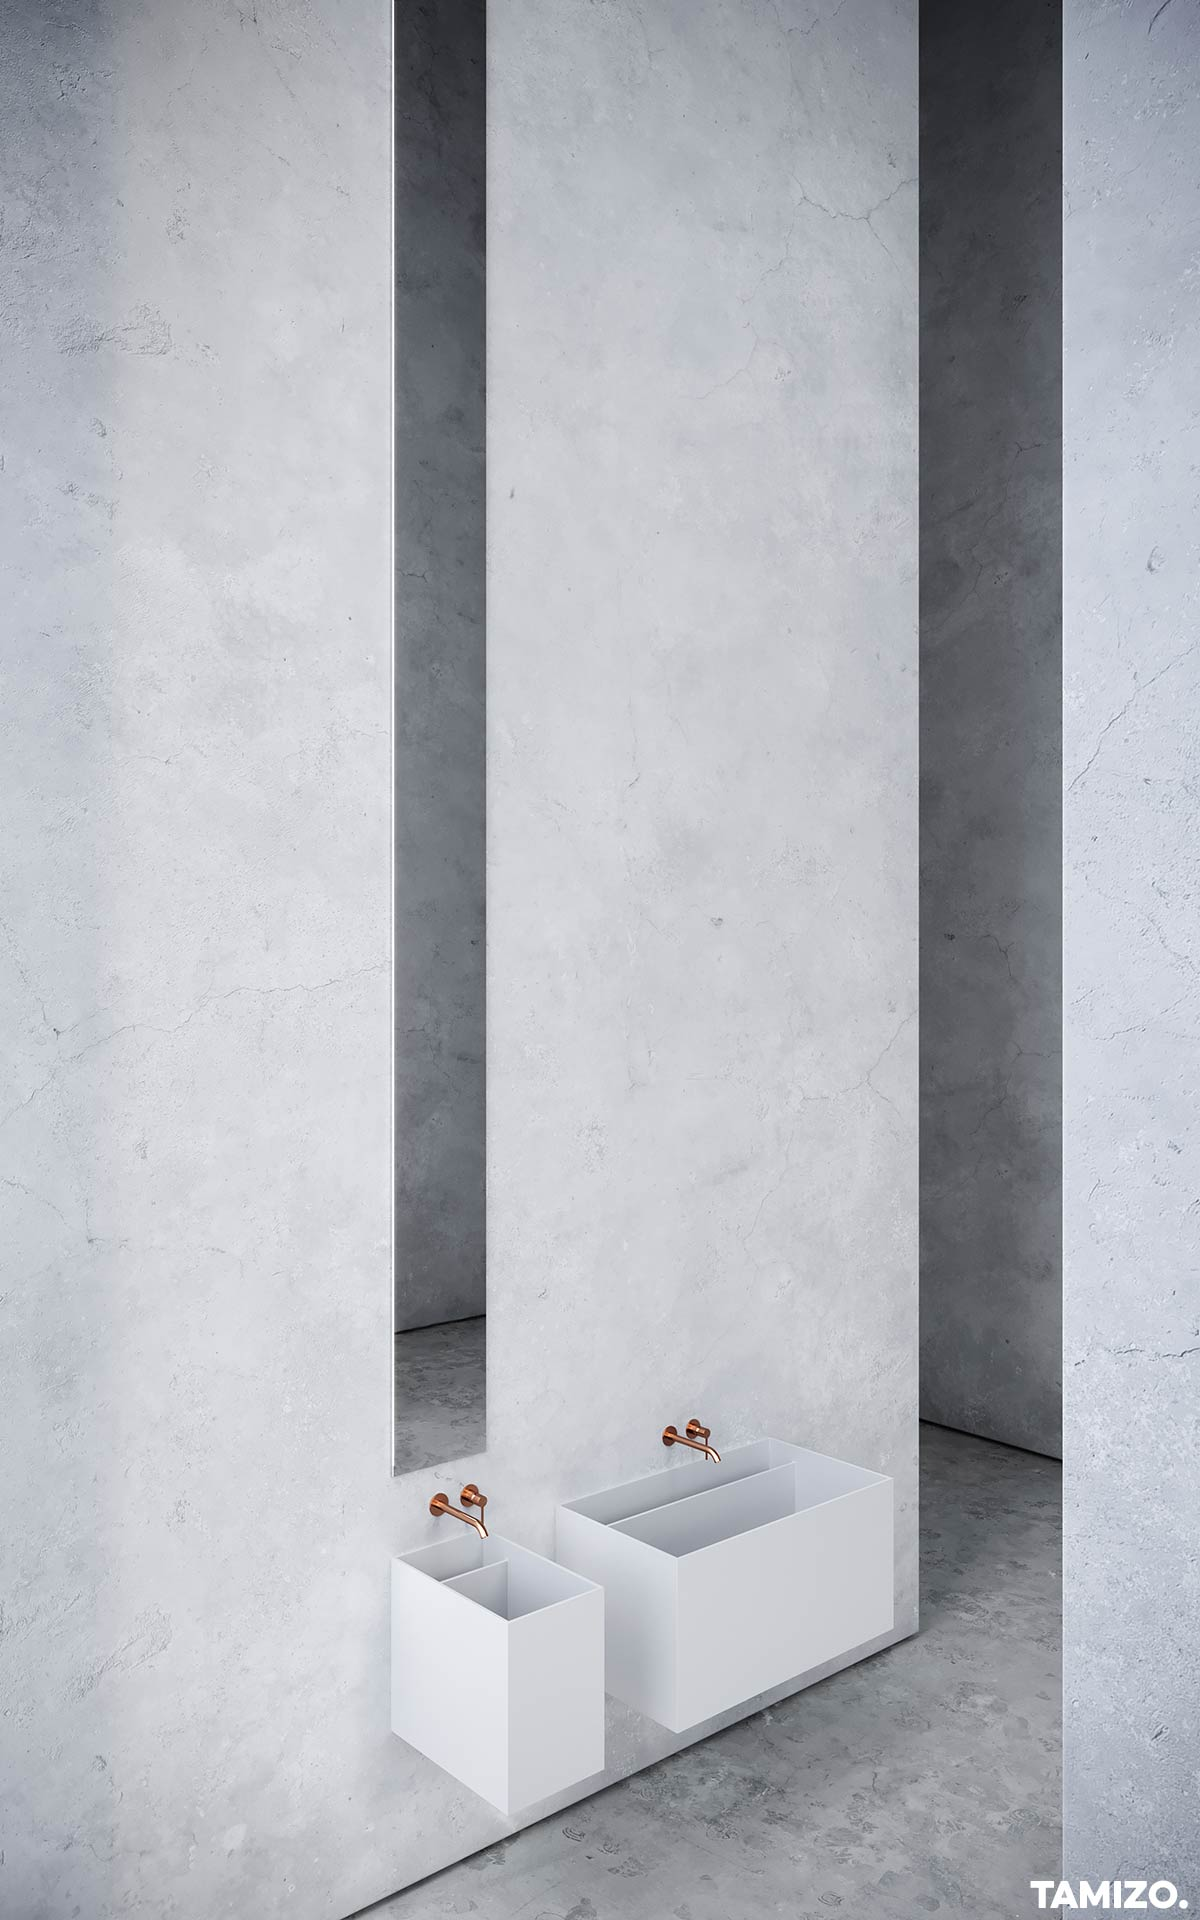 minimall_minimallone_ontheedge_bathroom_bathtub_washbasin_industrial_design_project_06